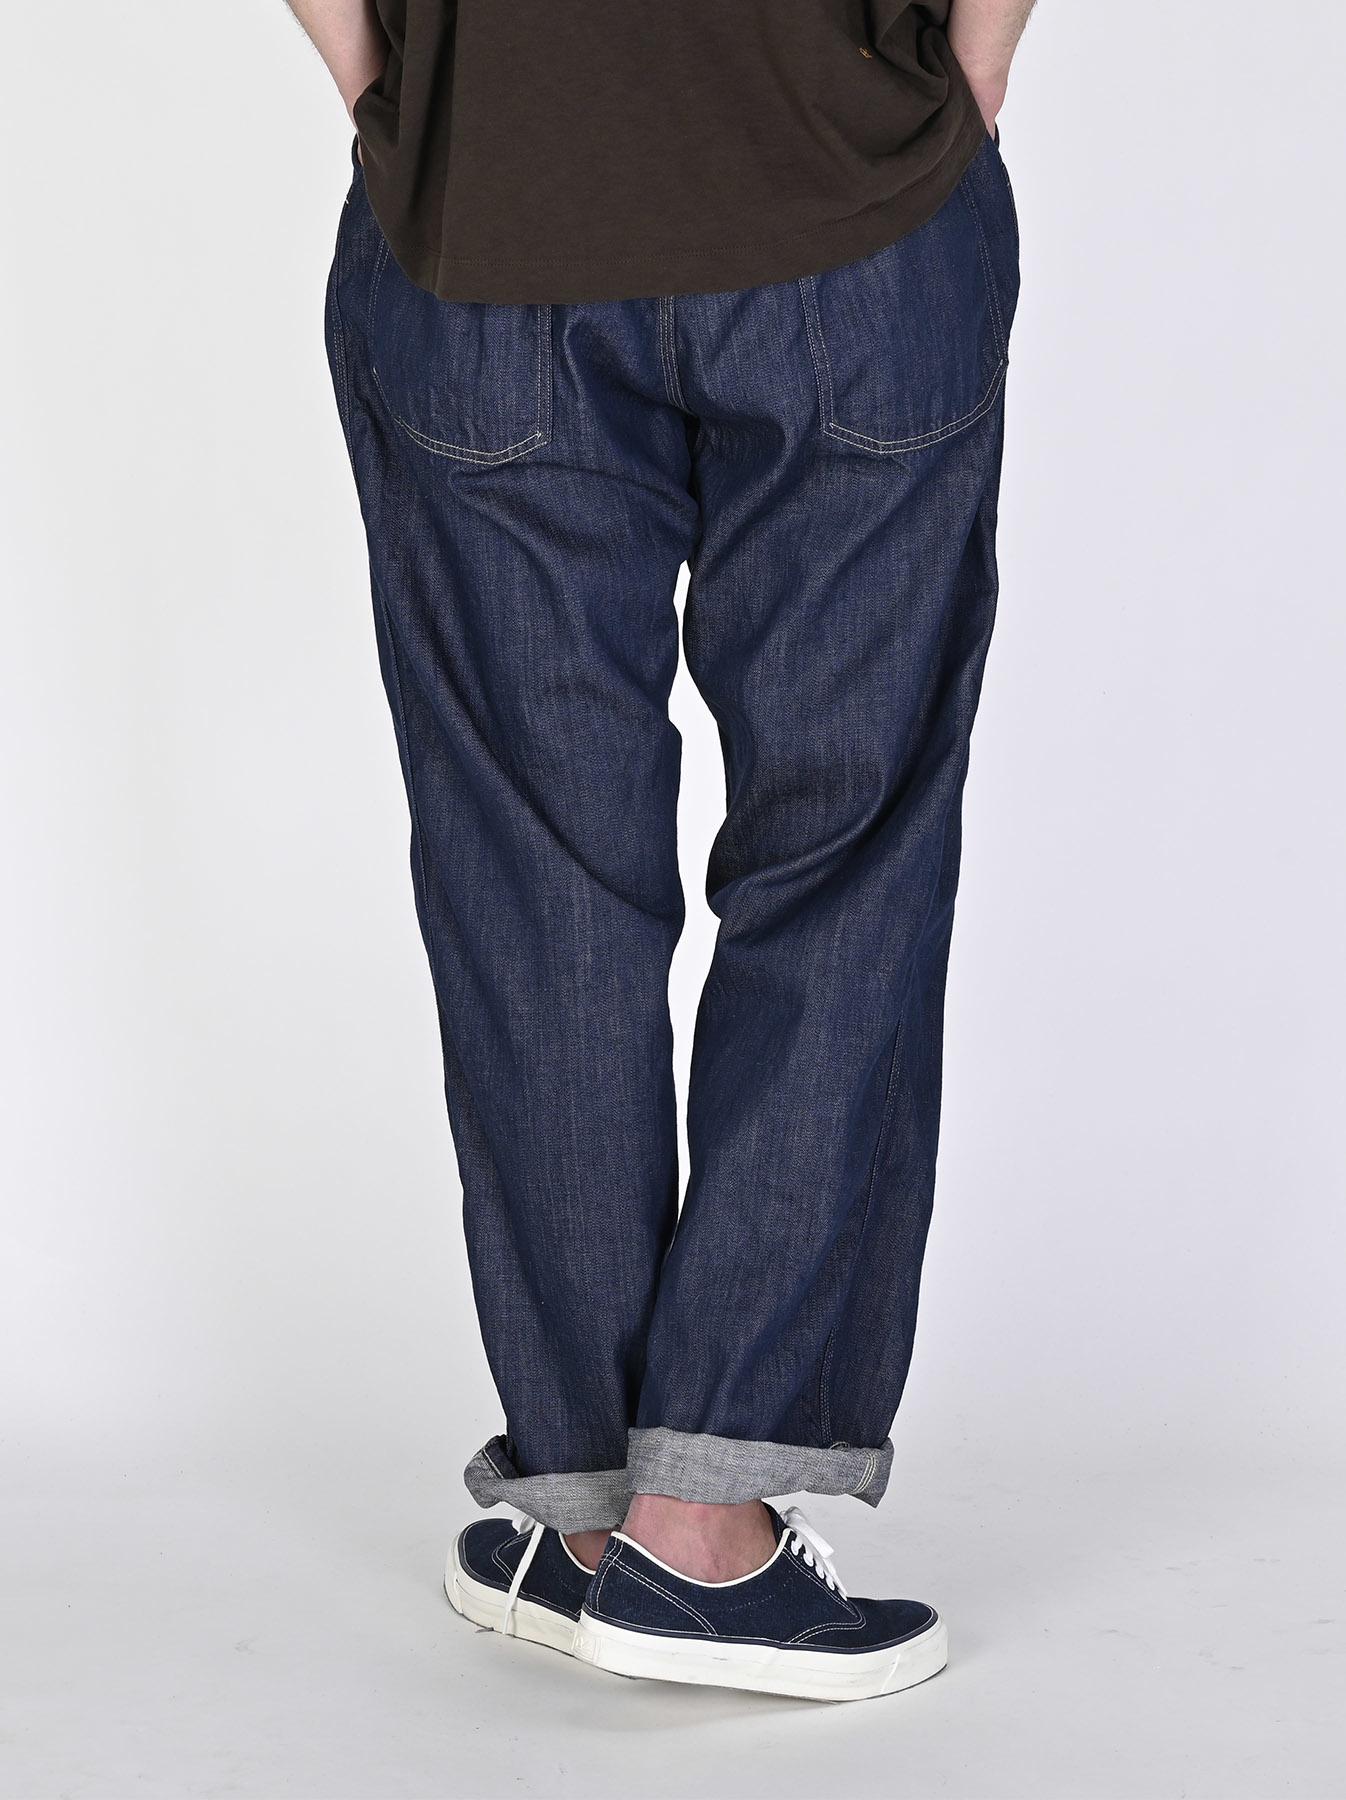 Indigo Nou 908 Painter Pants (0721)-4